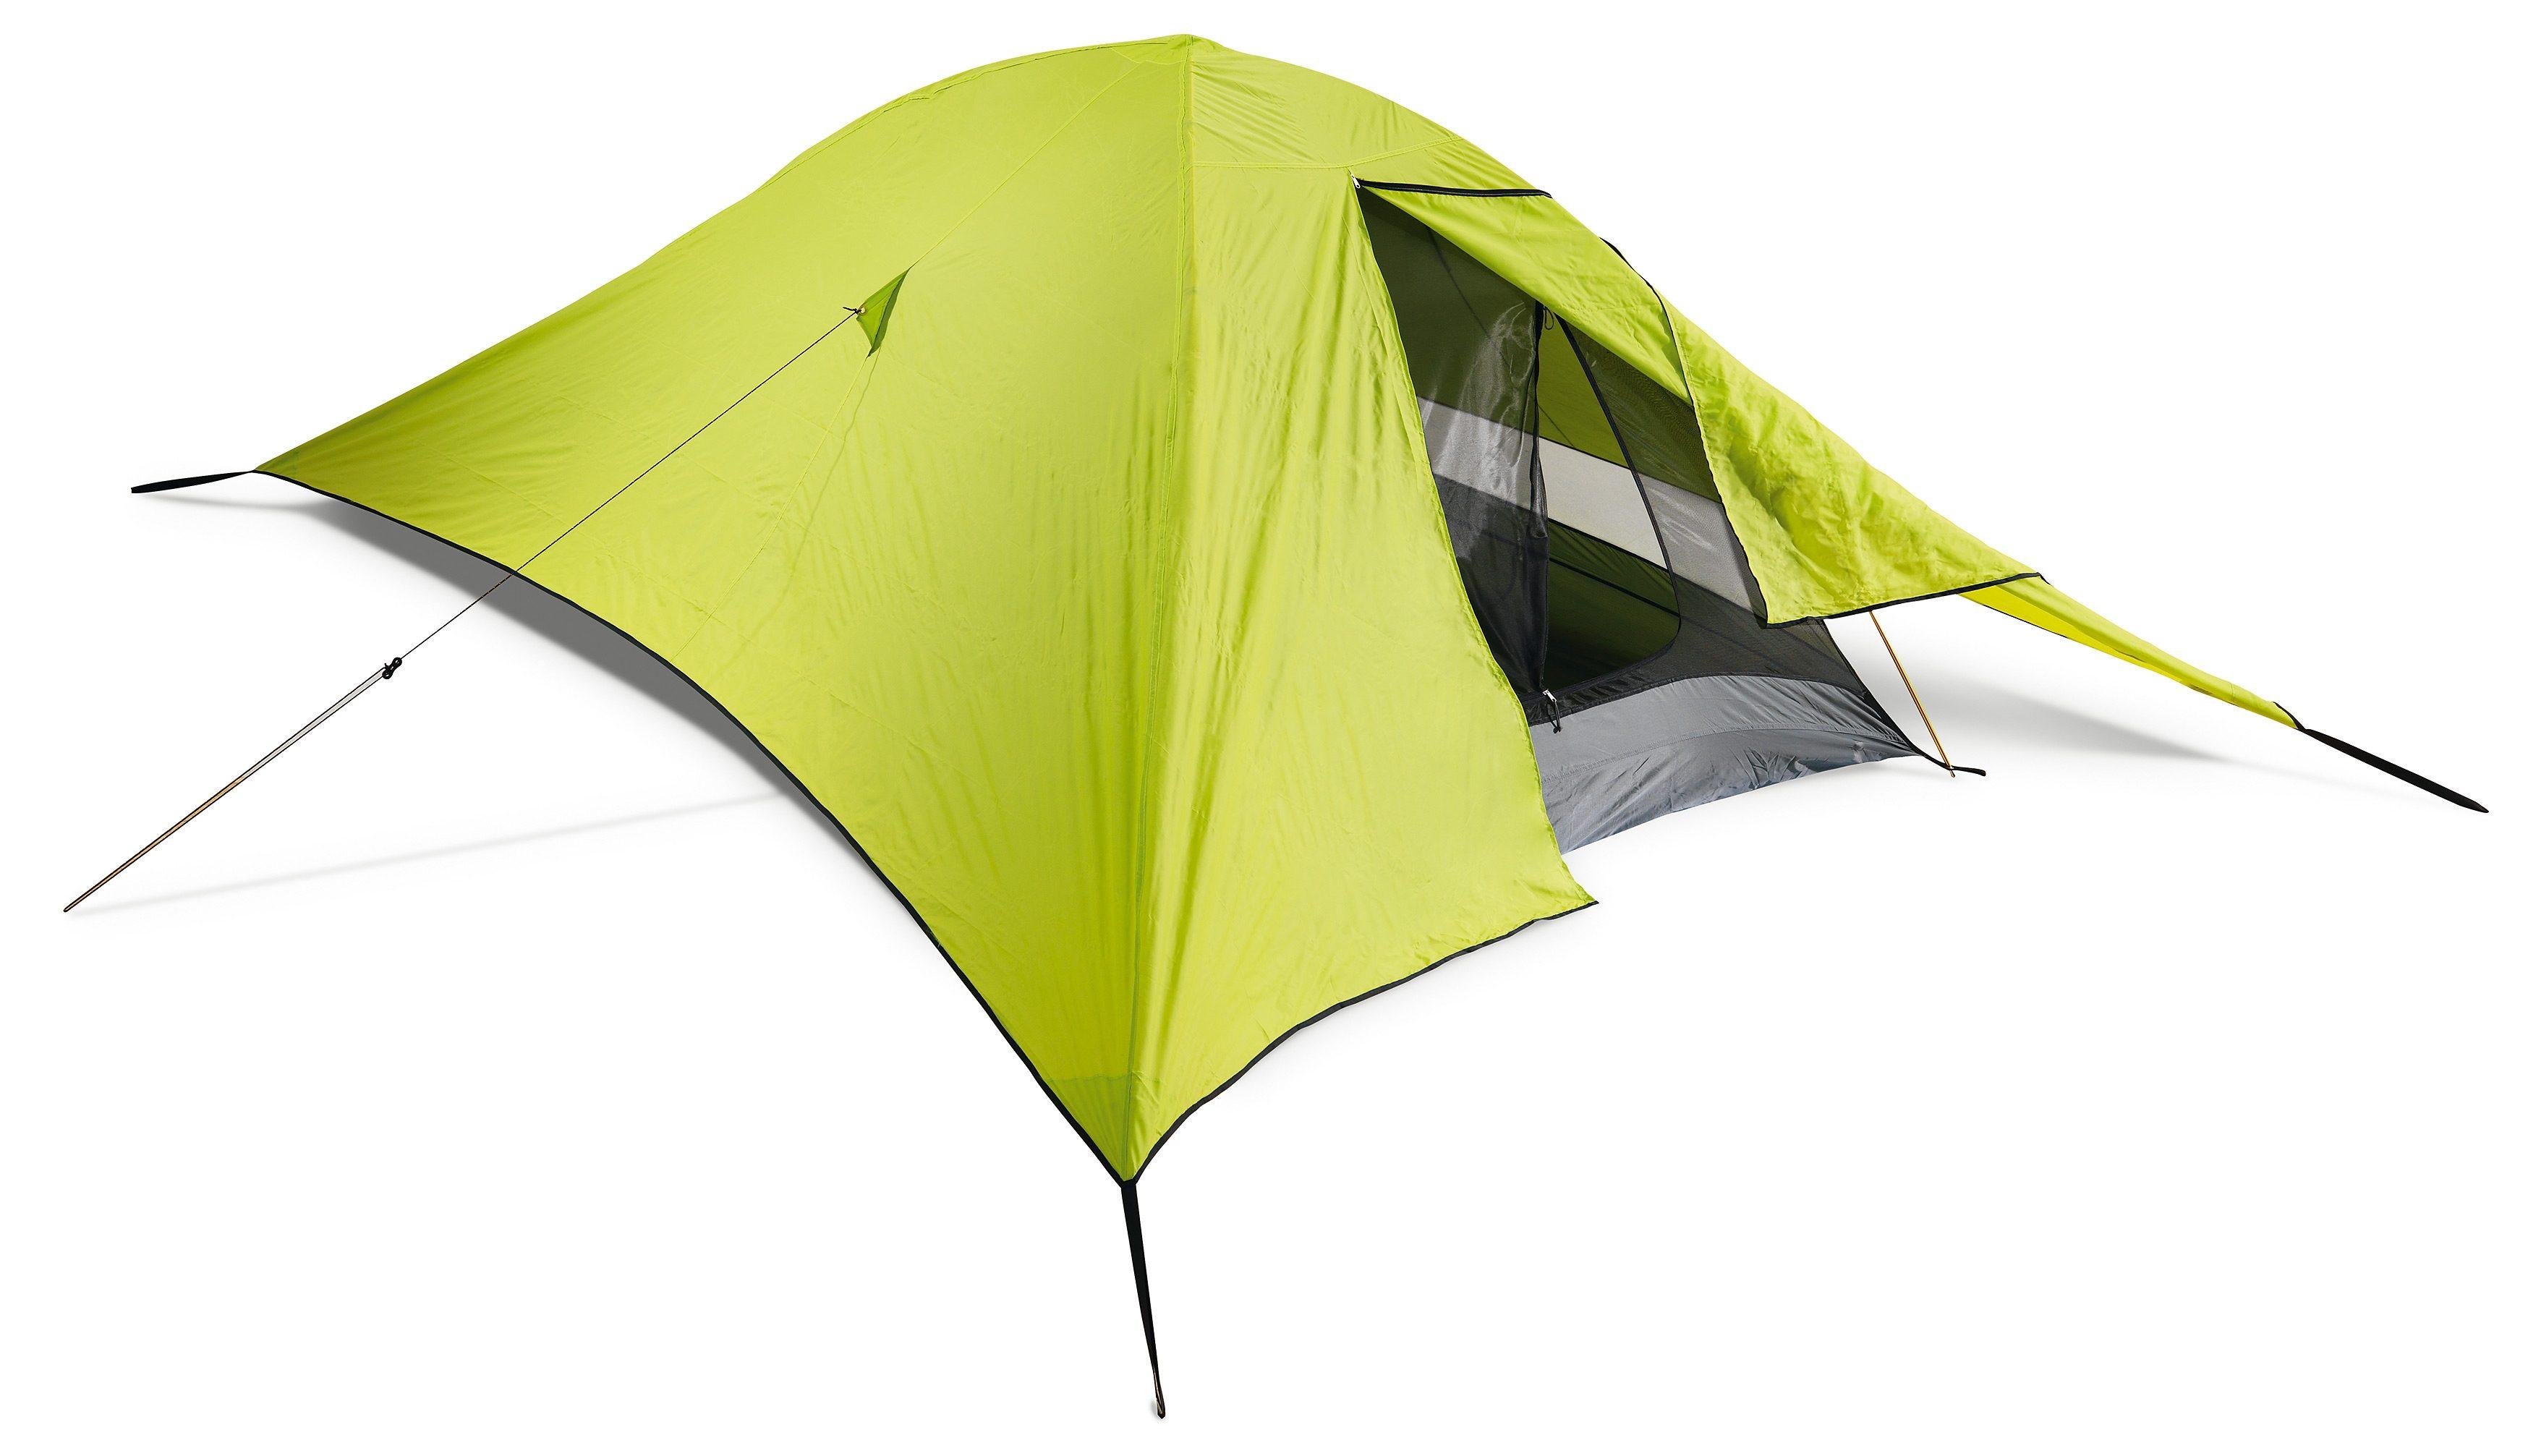 Cocoon Zeltzubehör »Mosquito Dome Rain Fly Rain Fly Tent«